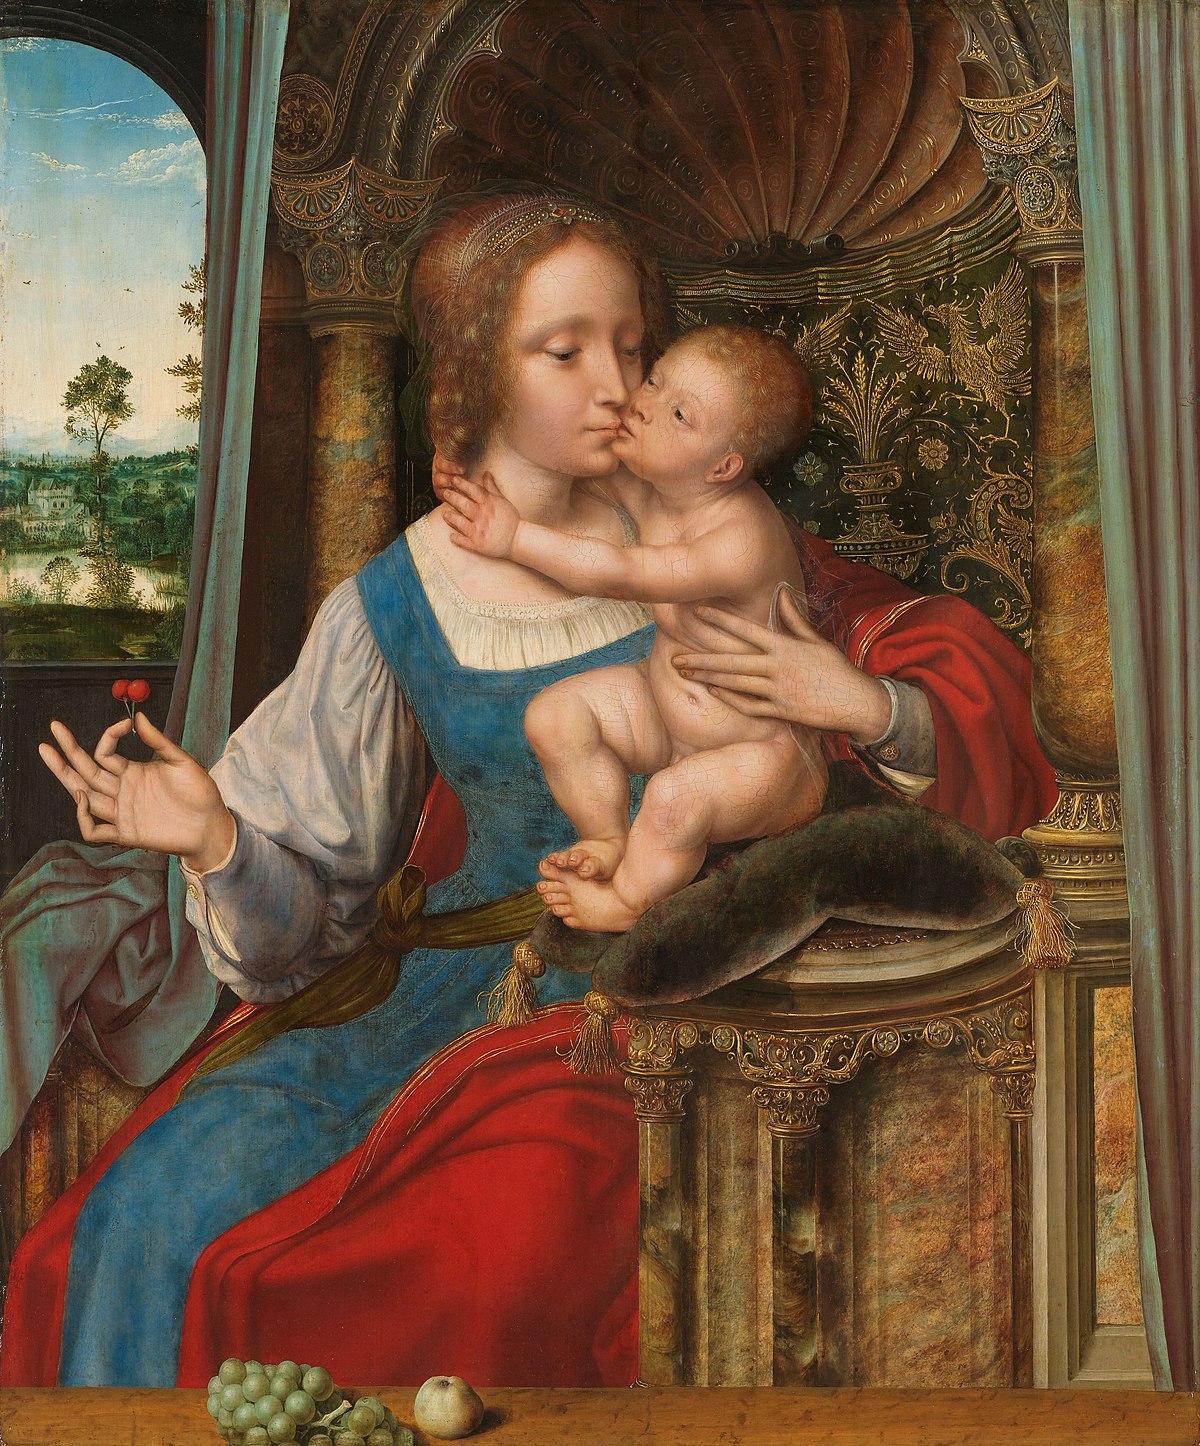 Madonna and Child Kissing - Wikipedia